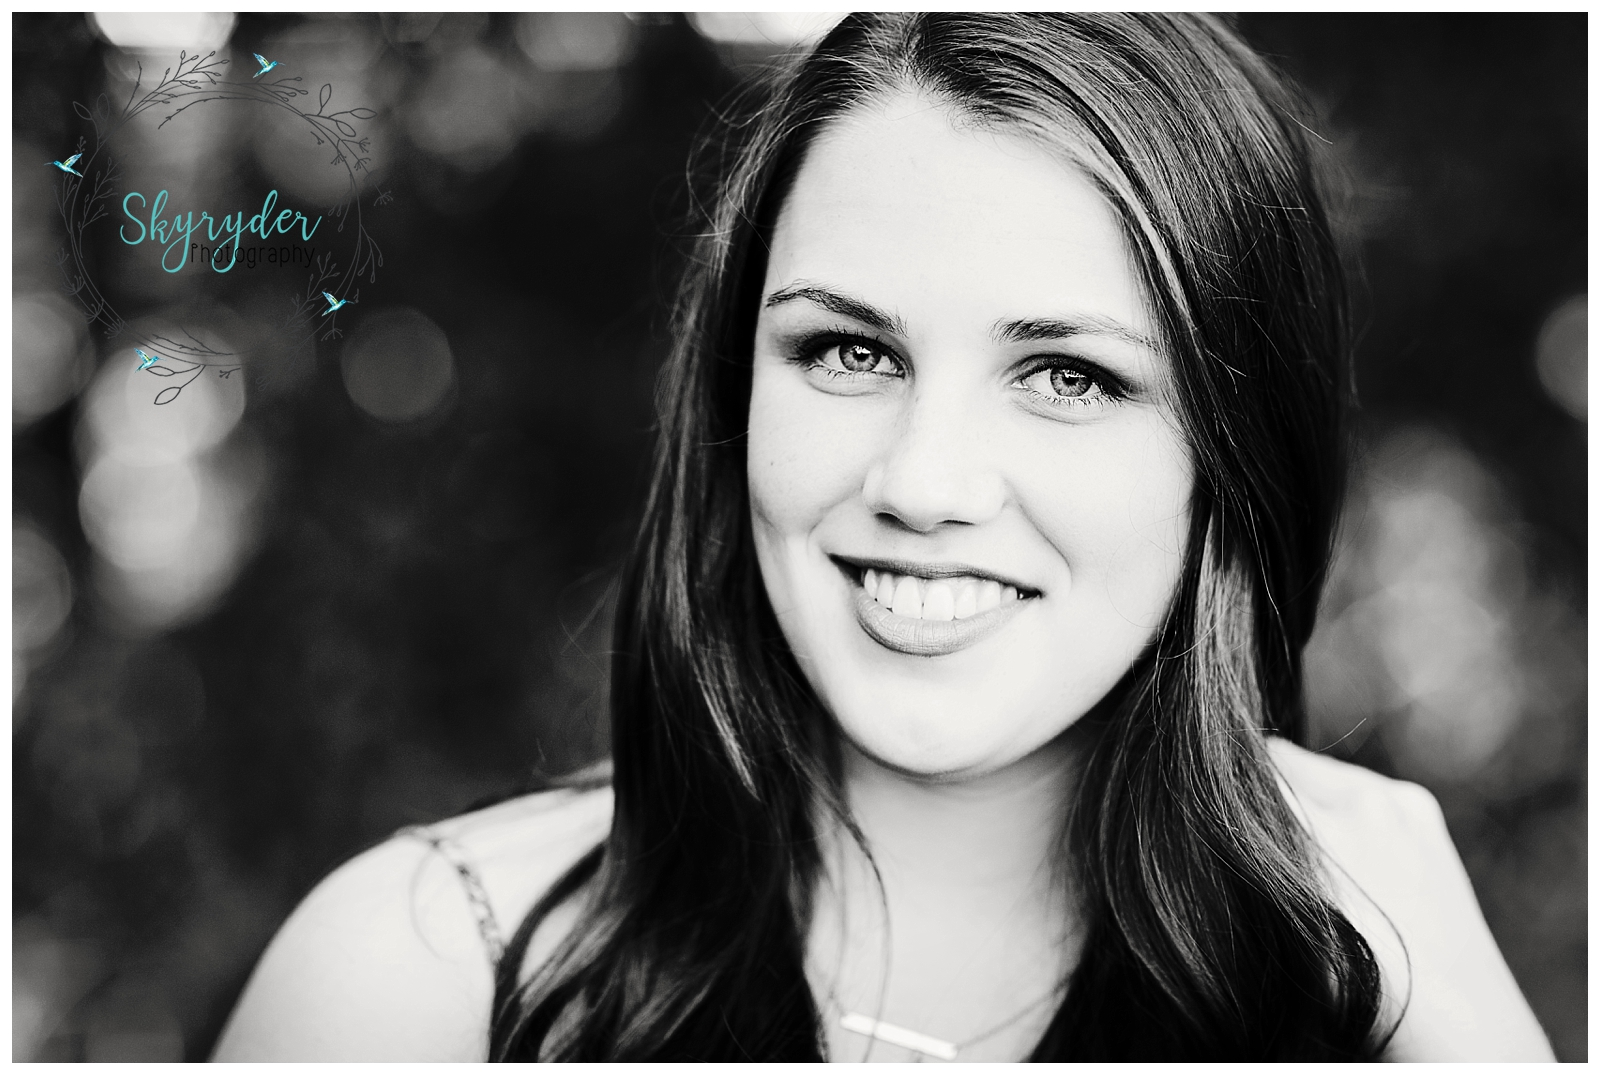 skyryder Blacksburg high school senior session photographer roanoke